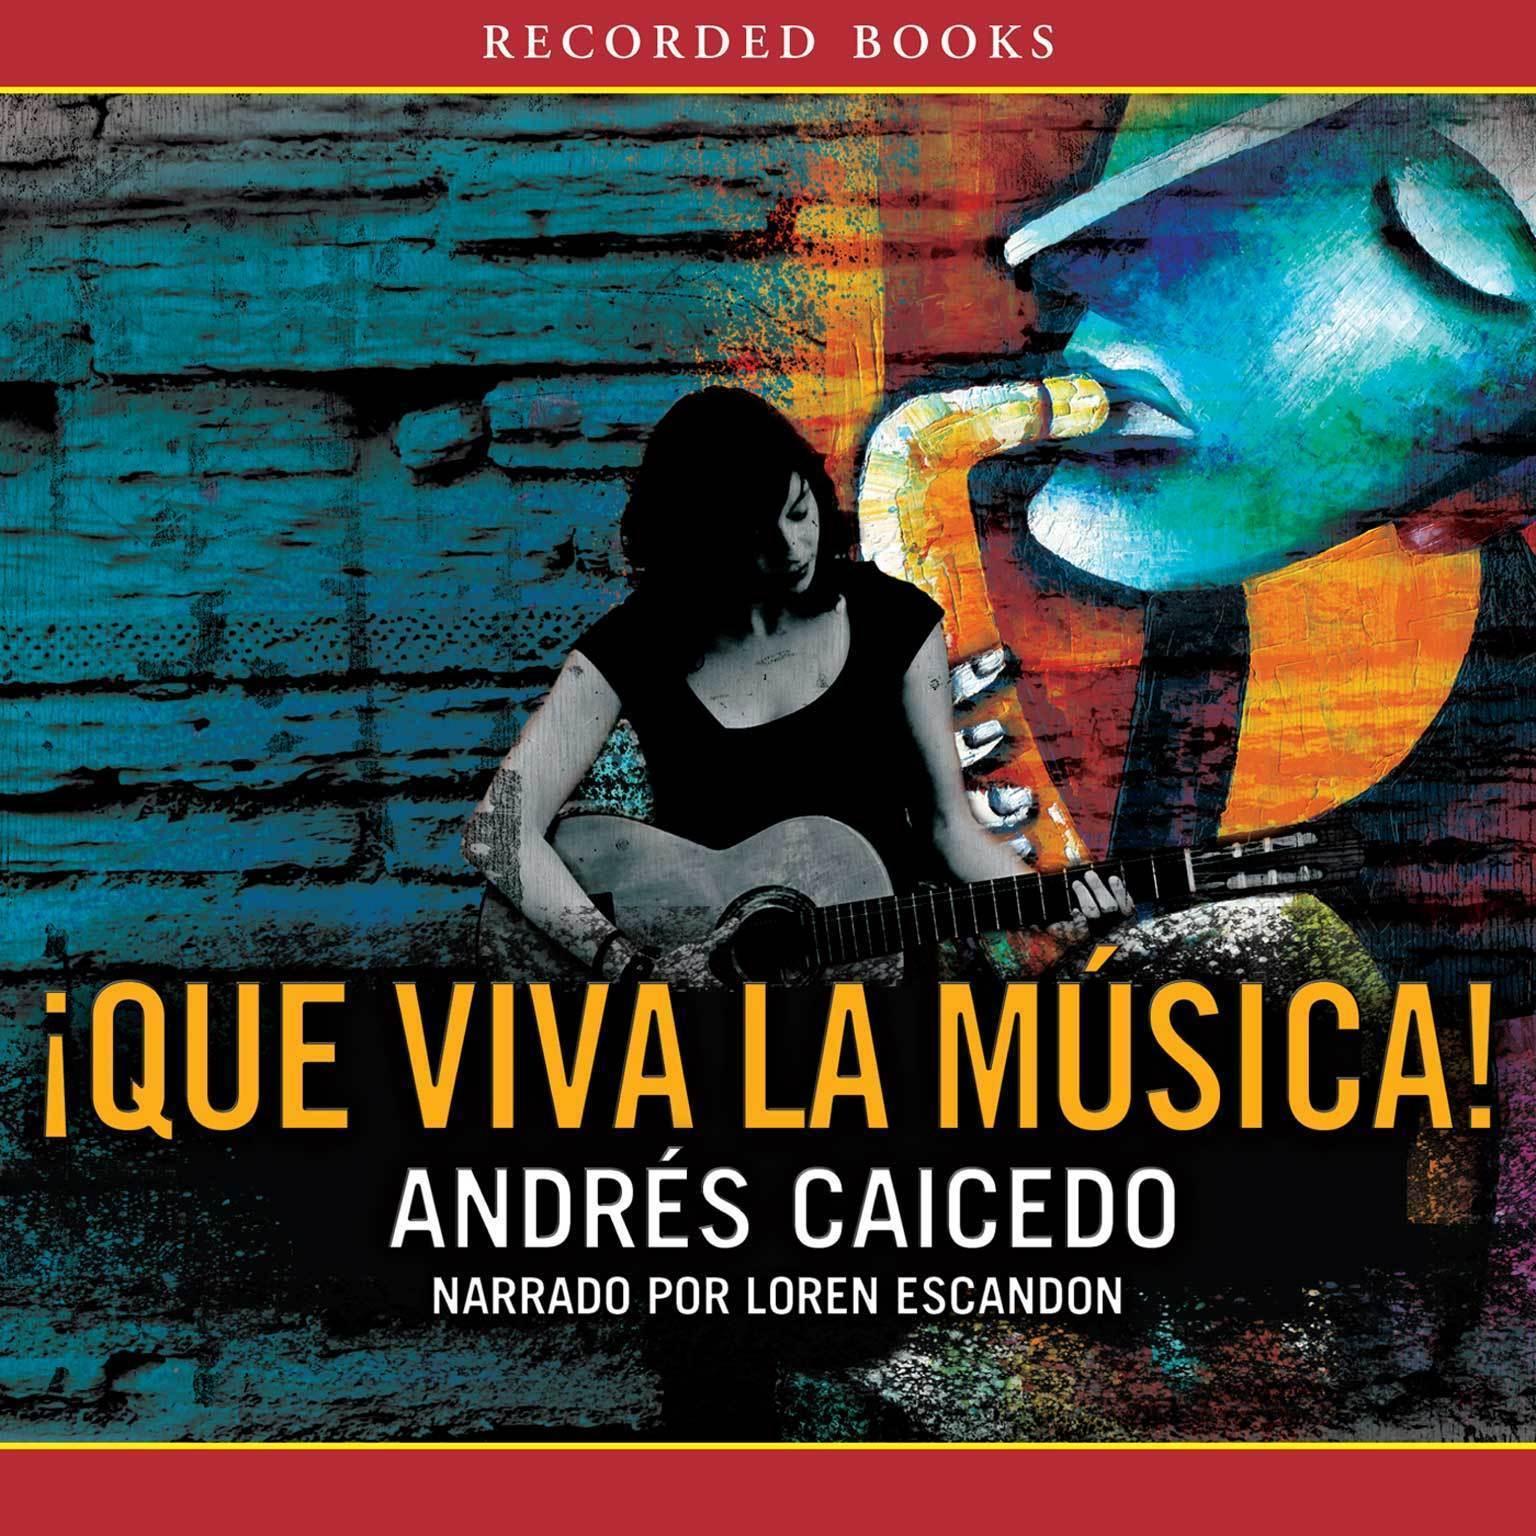 Printable Que viva la musical Audiobook Cover Art